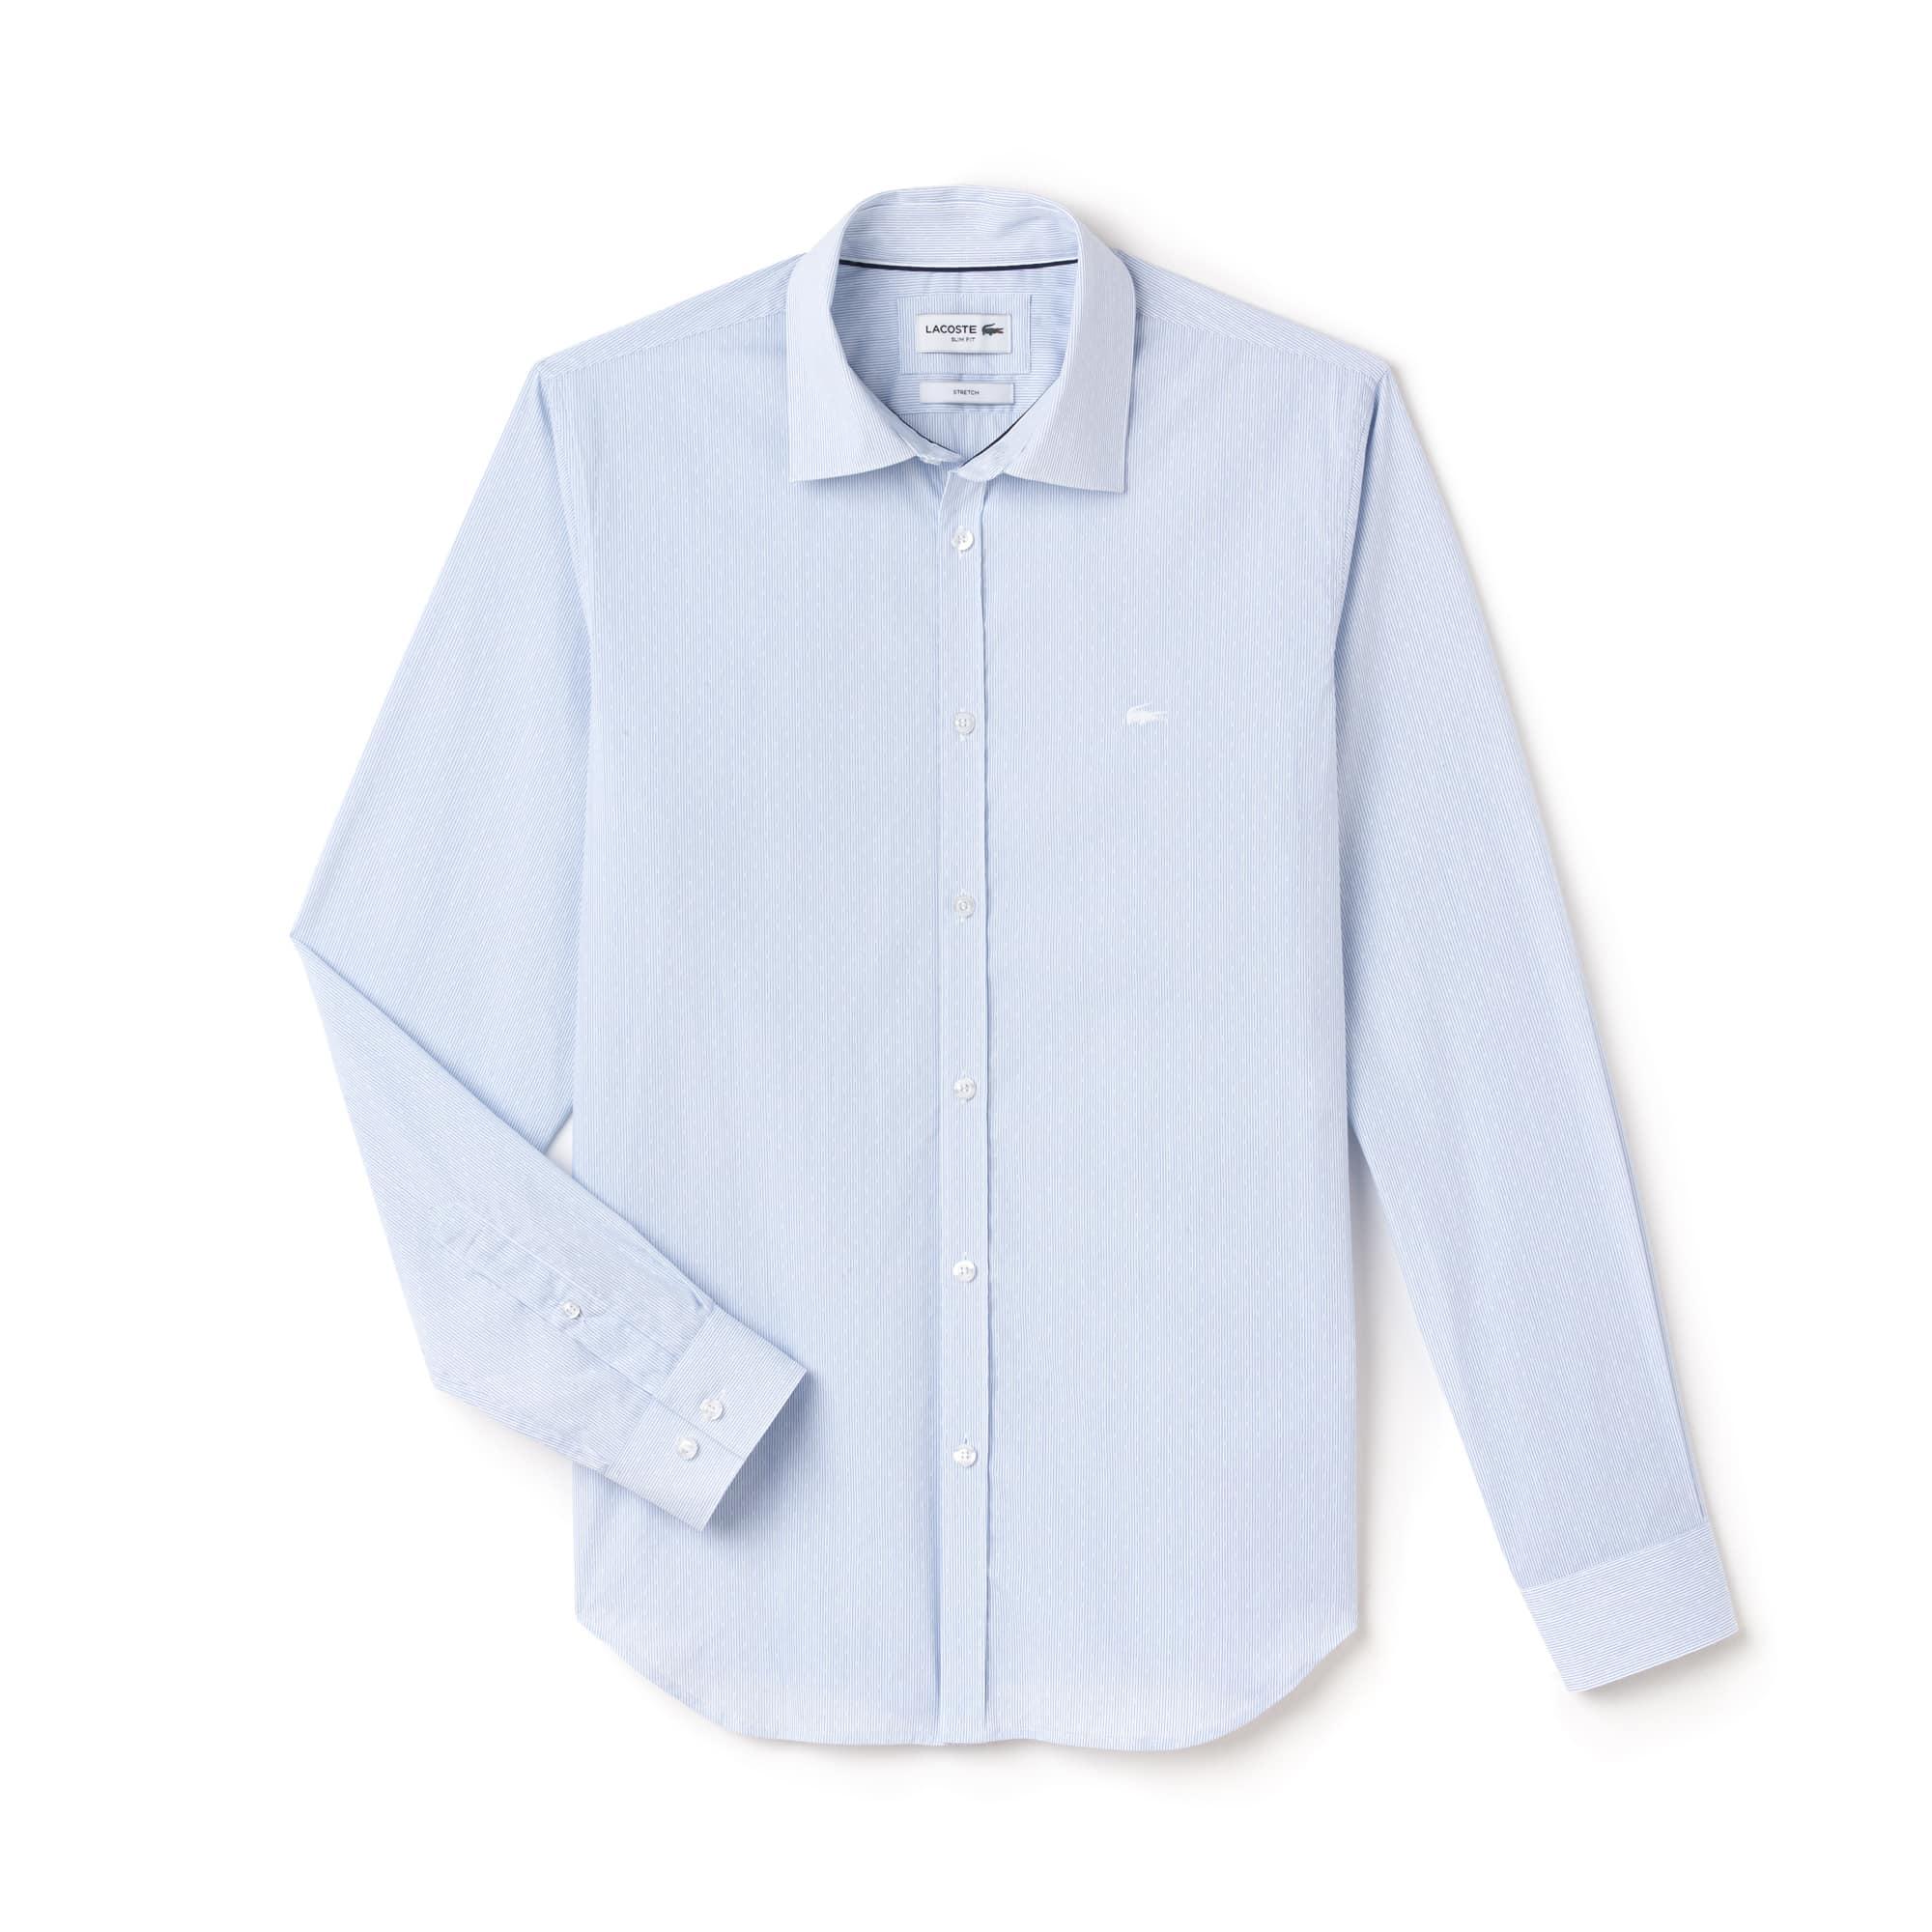 Men's Slim Fit Polka Dots And Stripes Jacquard Poplin Shirt